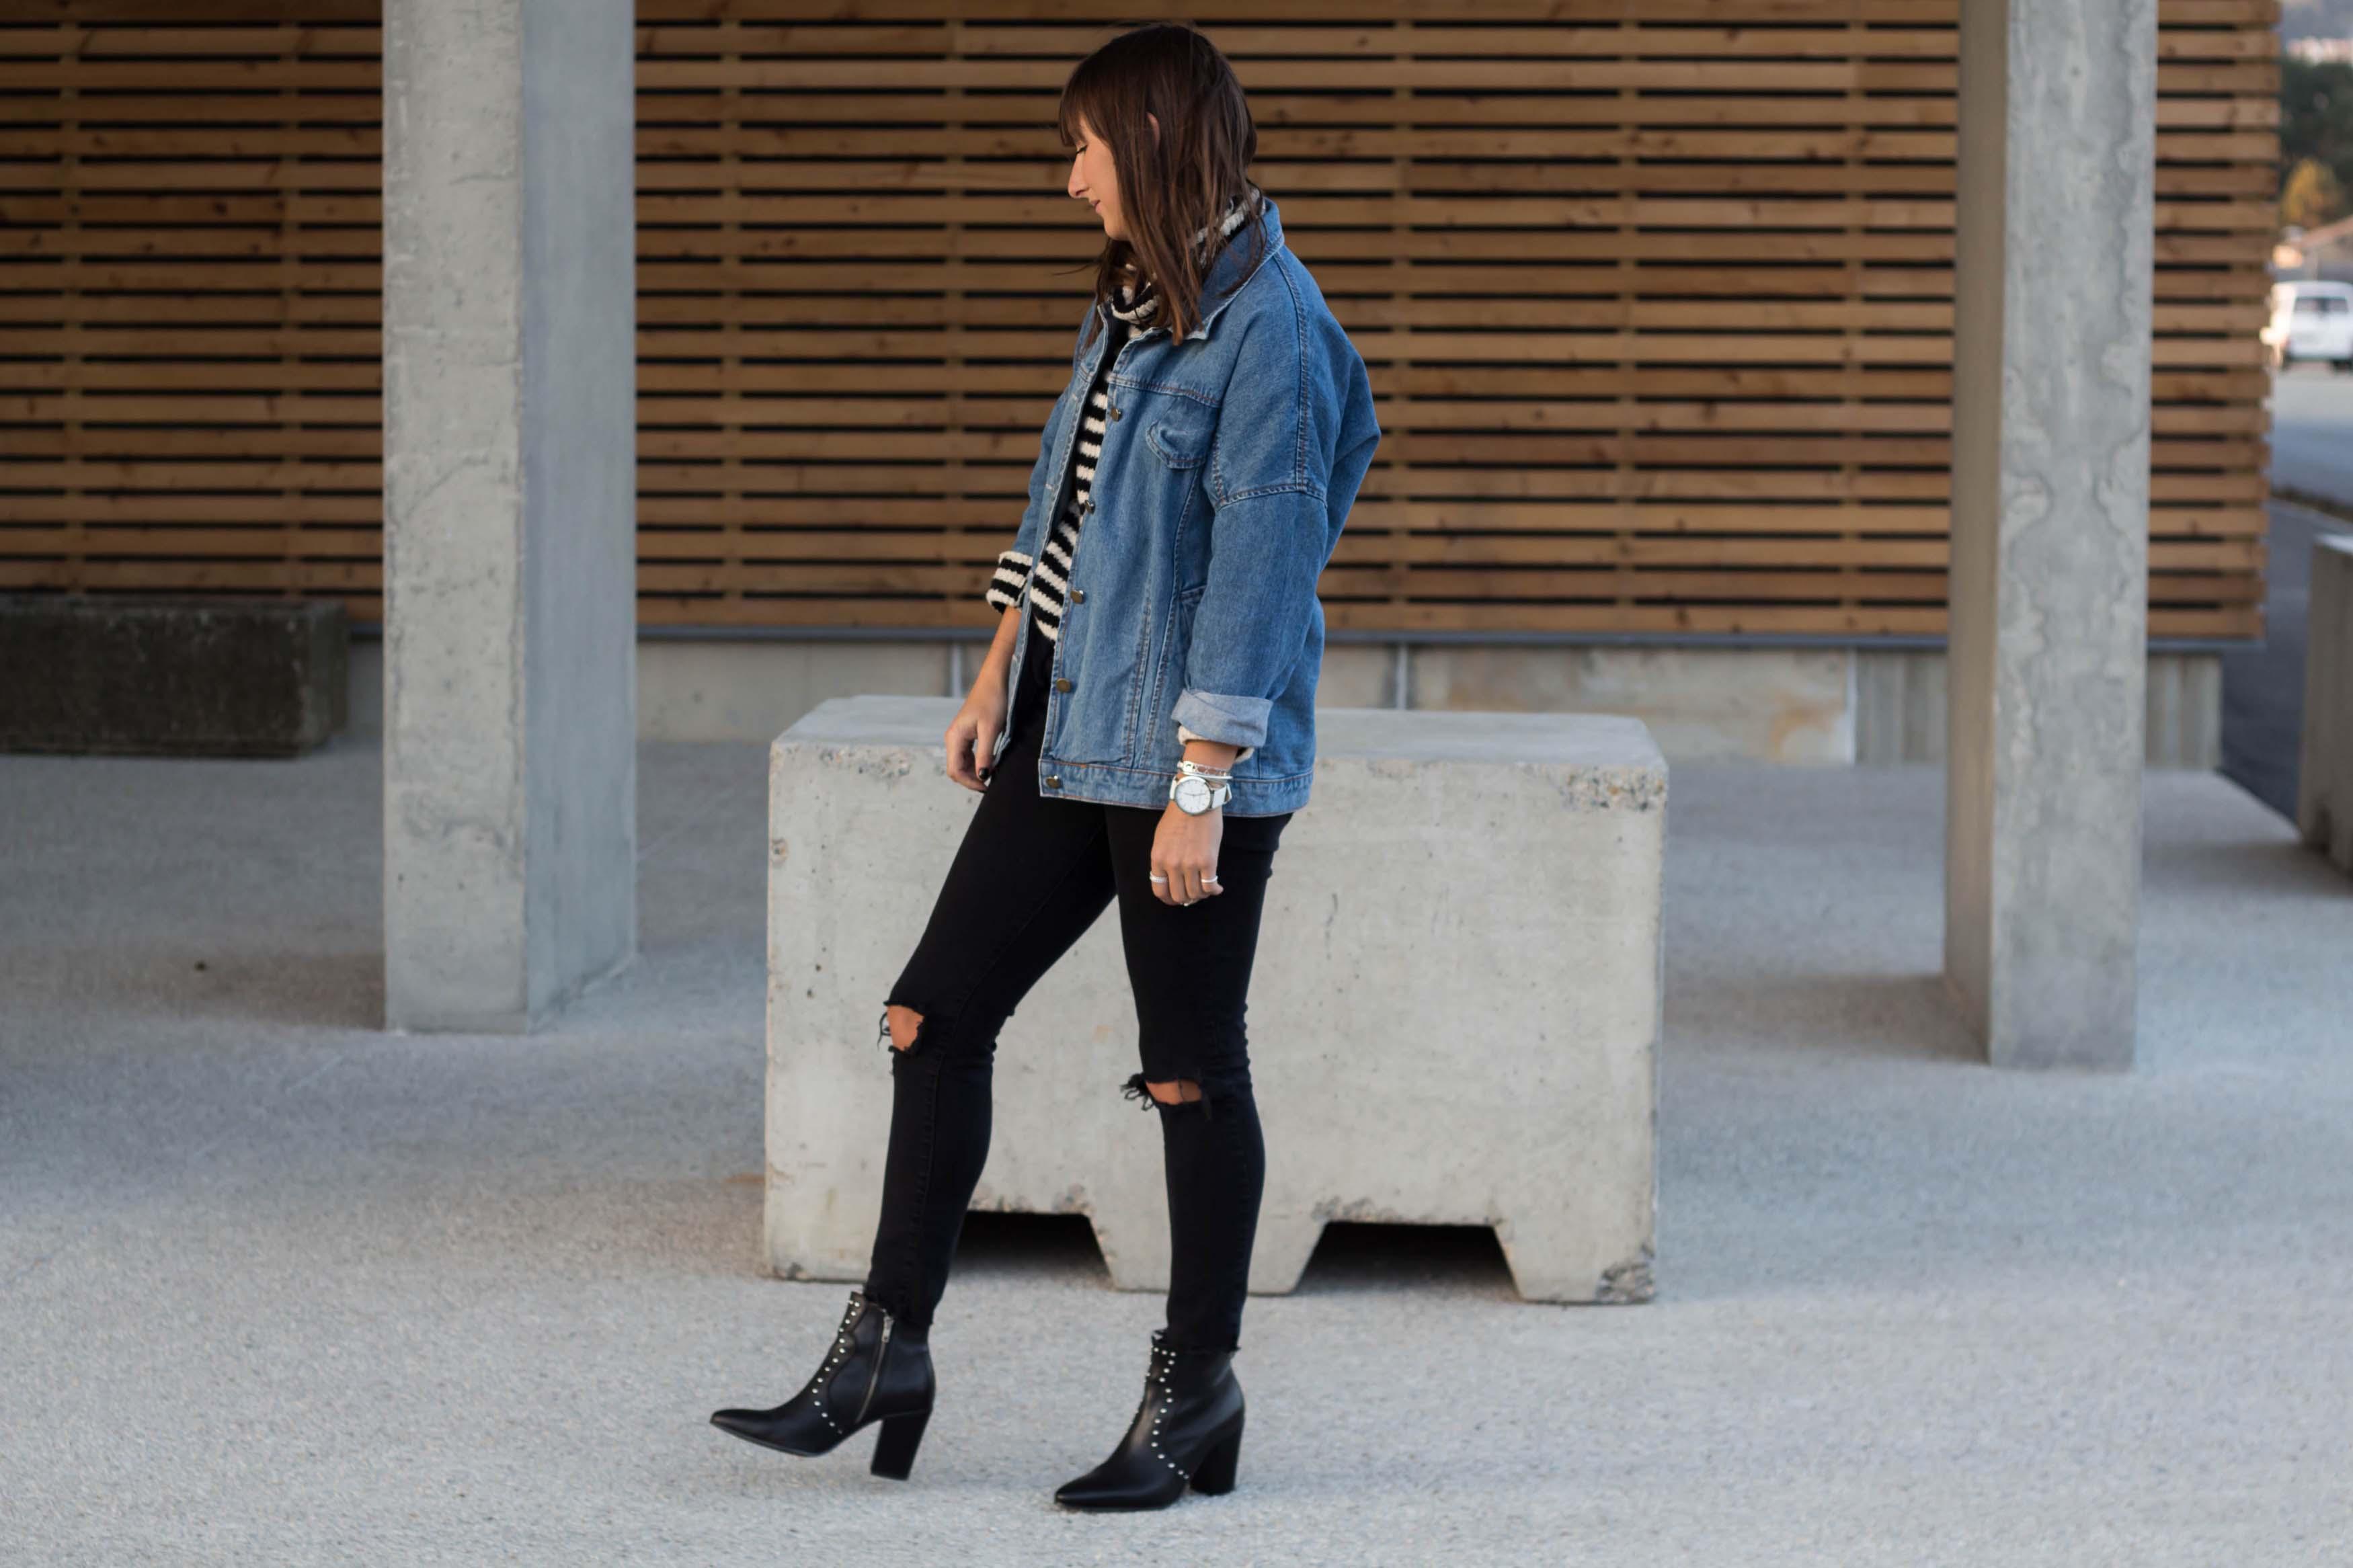 blog-mode-jean-shein-linstantflo-14-sur-18